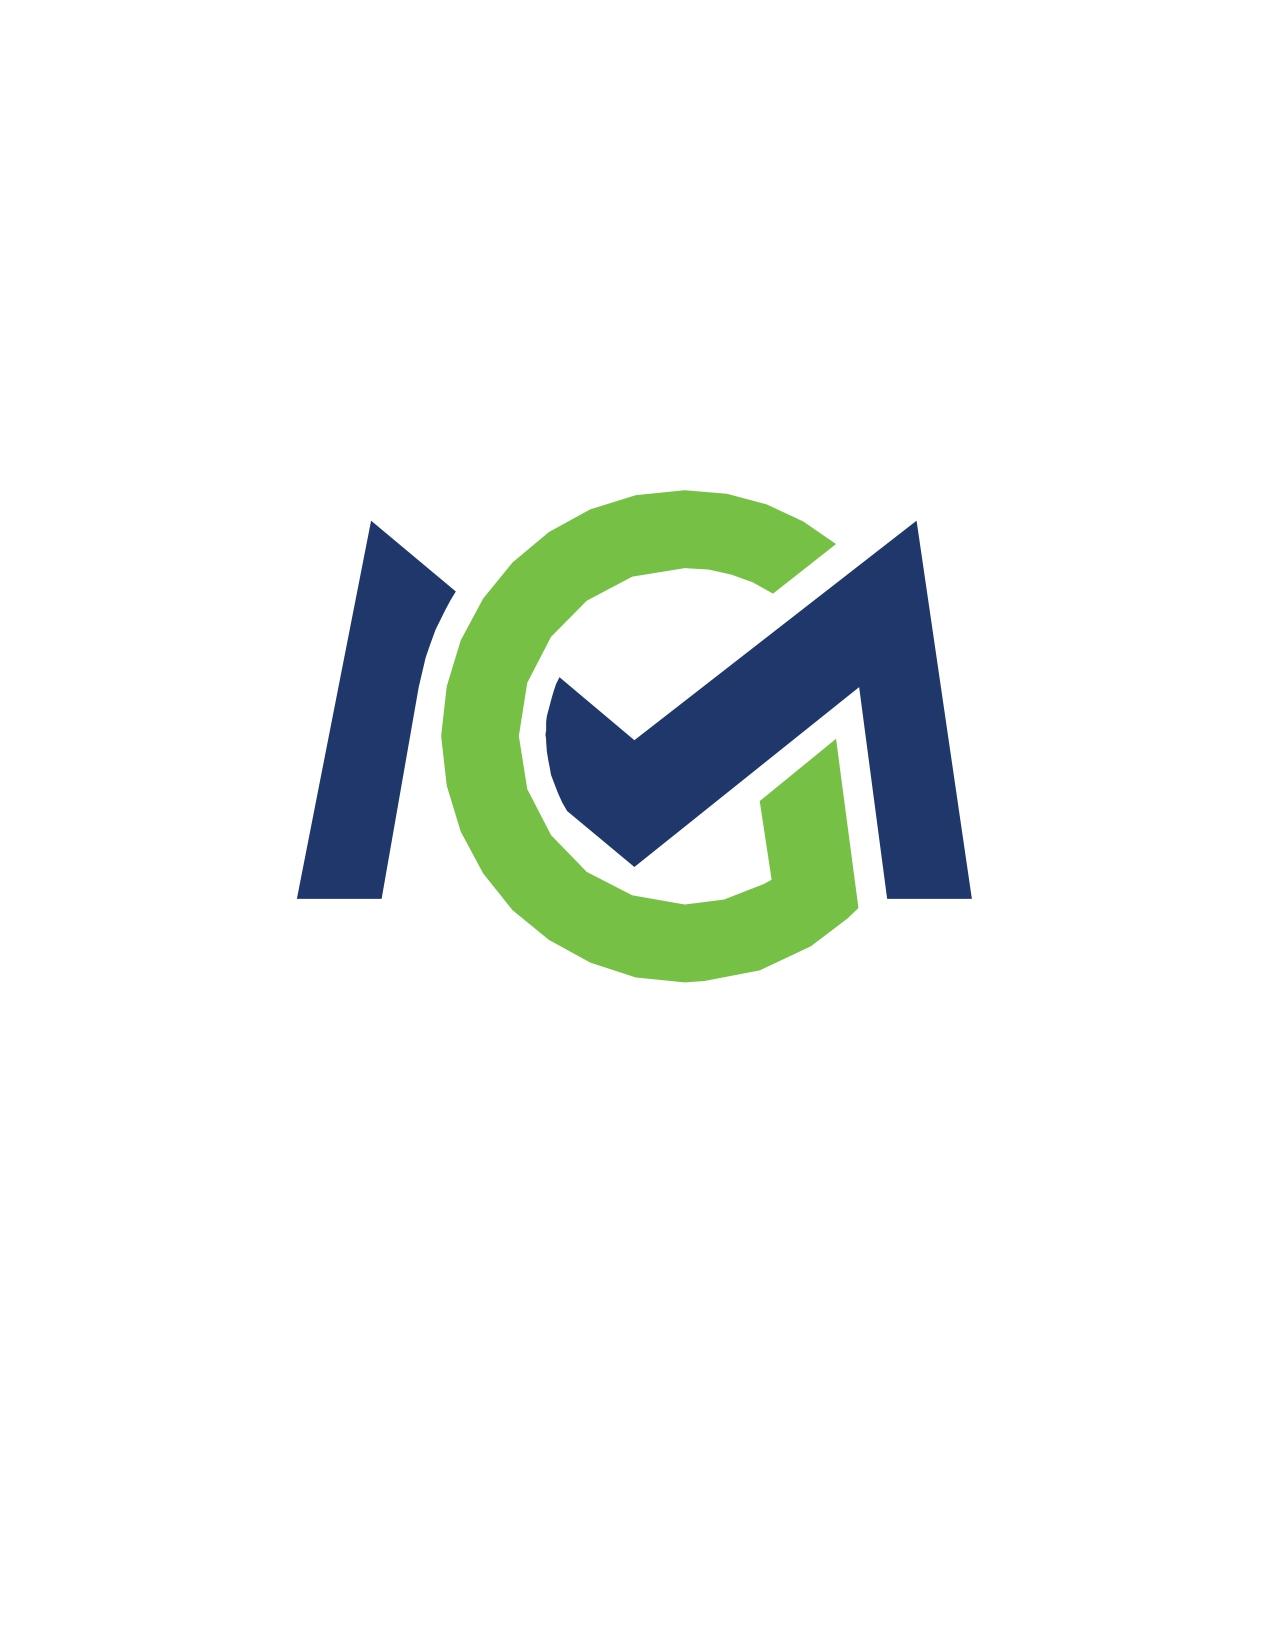 https://www.mncjobs.co.za/company/giddimiggs-industries